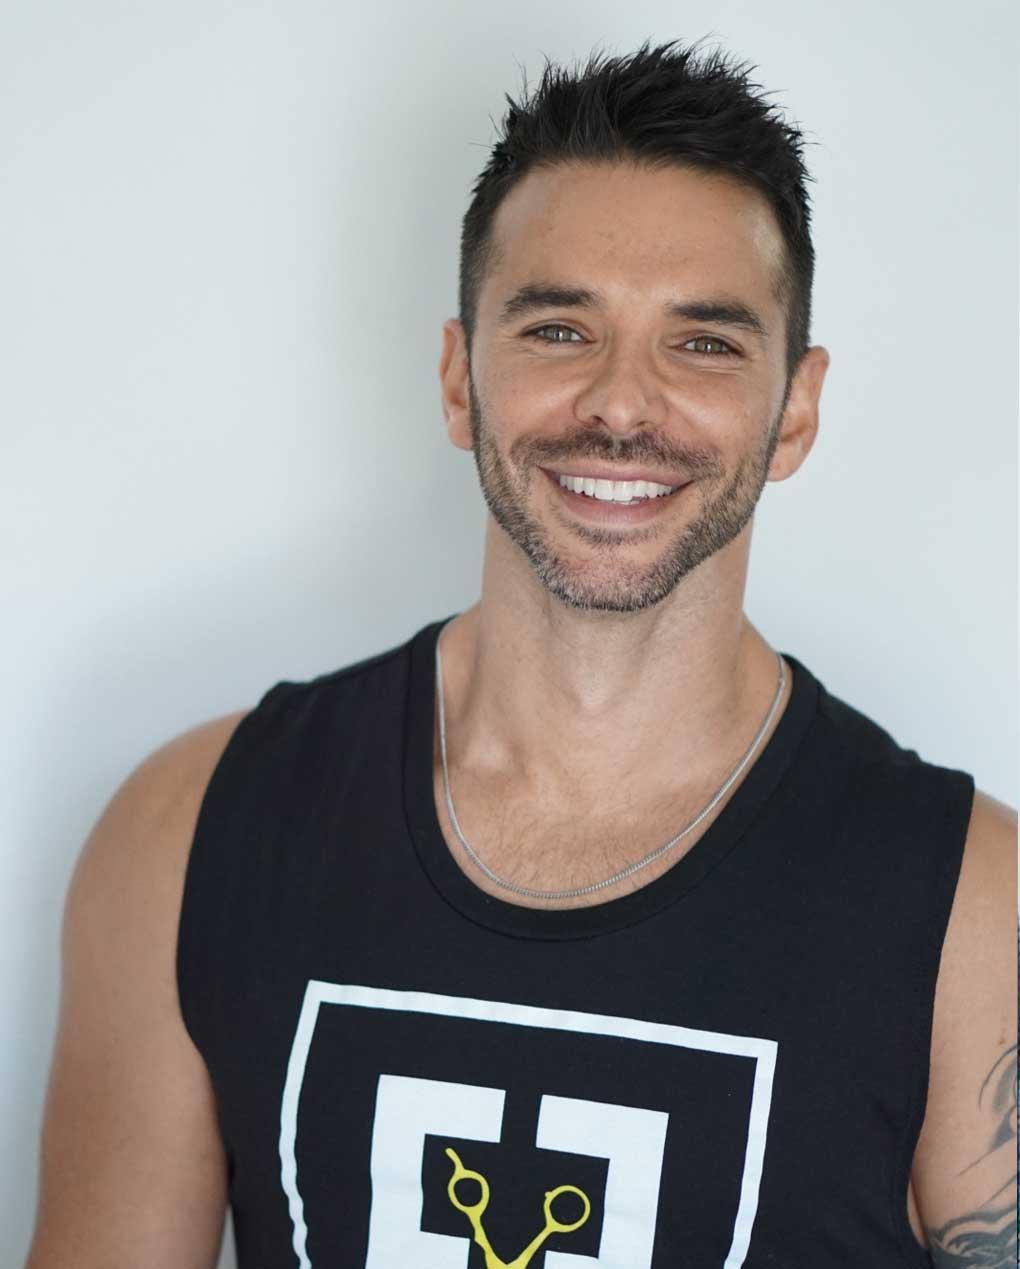 John Gatto - Orlando Hair Stylist Educe Salon